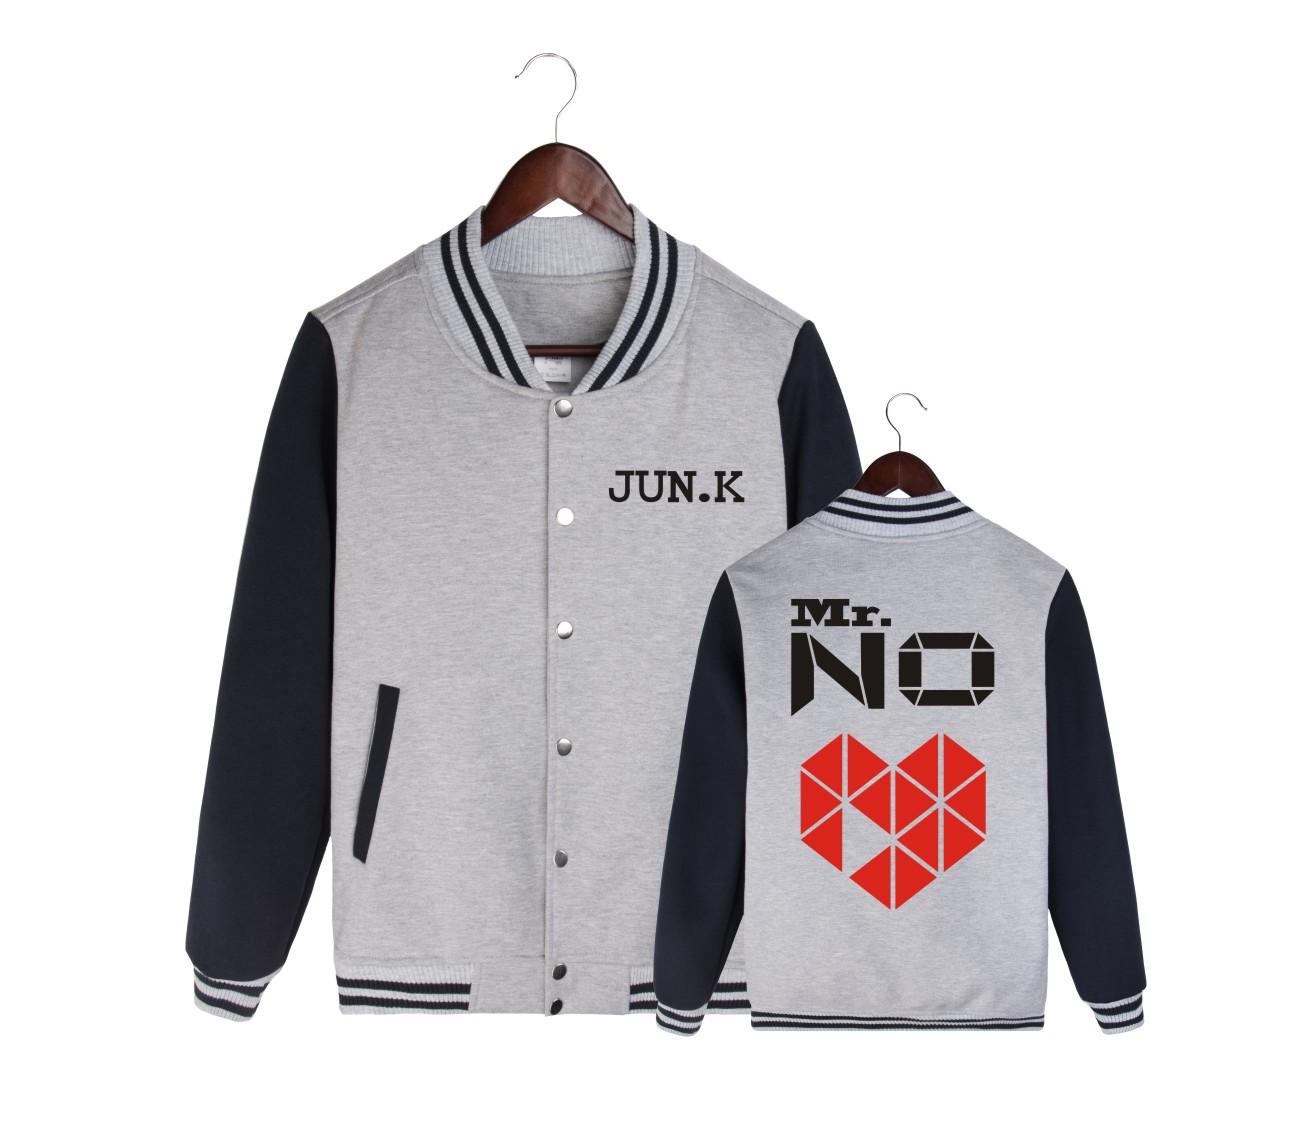 2PM金峻秀JUN.KSOLO棒球Mr.NO演唱会周边同款男女衣服卫衣专辑服